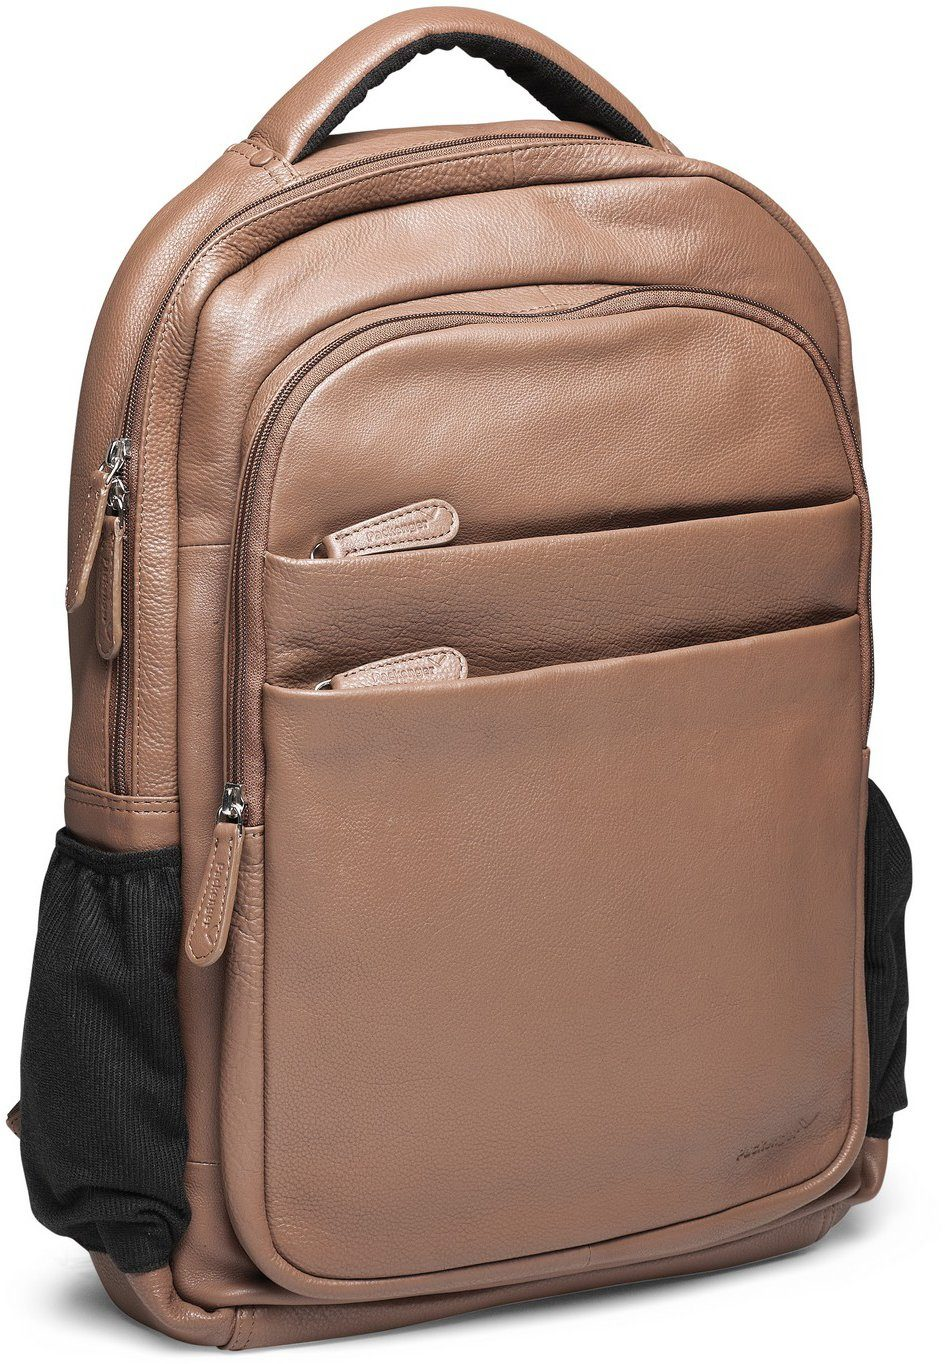 Packenger Rucksack mit 15-Zoll Laptoptasche, »Kjaran, hellbraun«